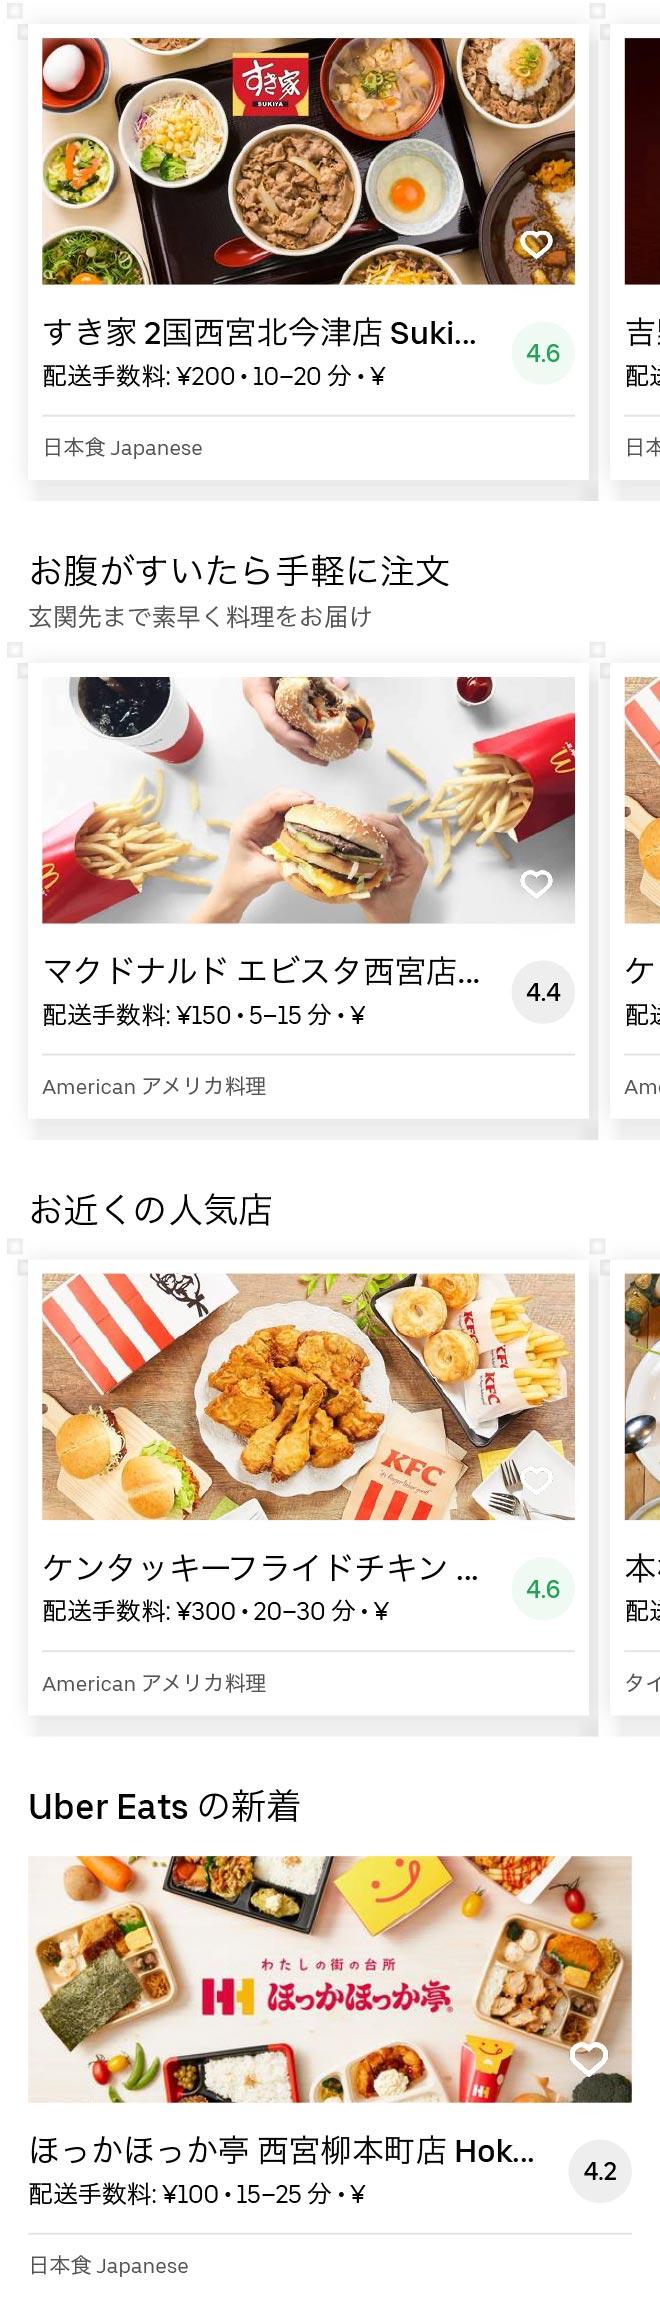 Nishinomiya hanshin menu 2005 01